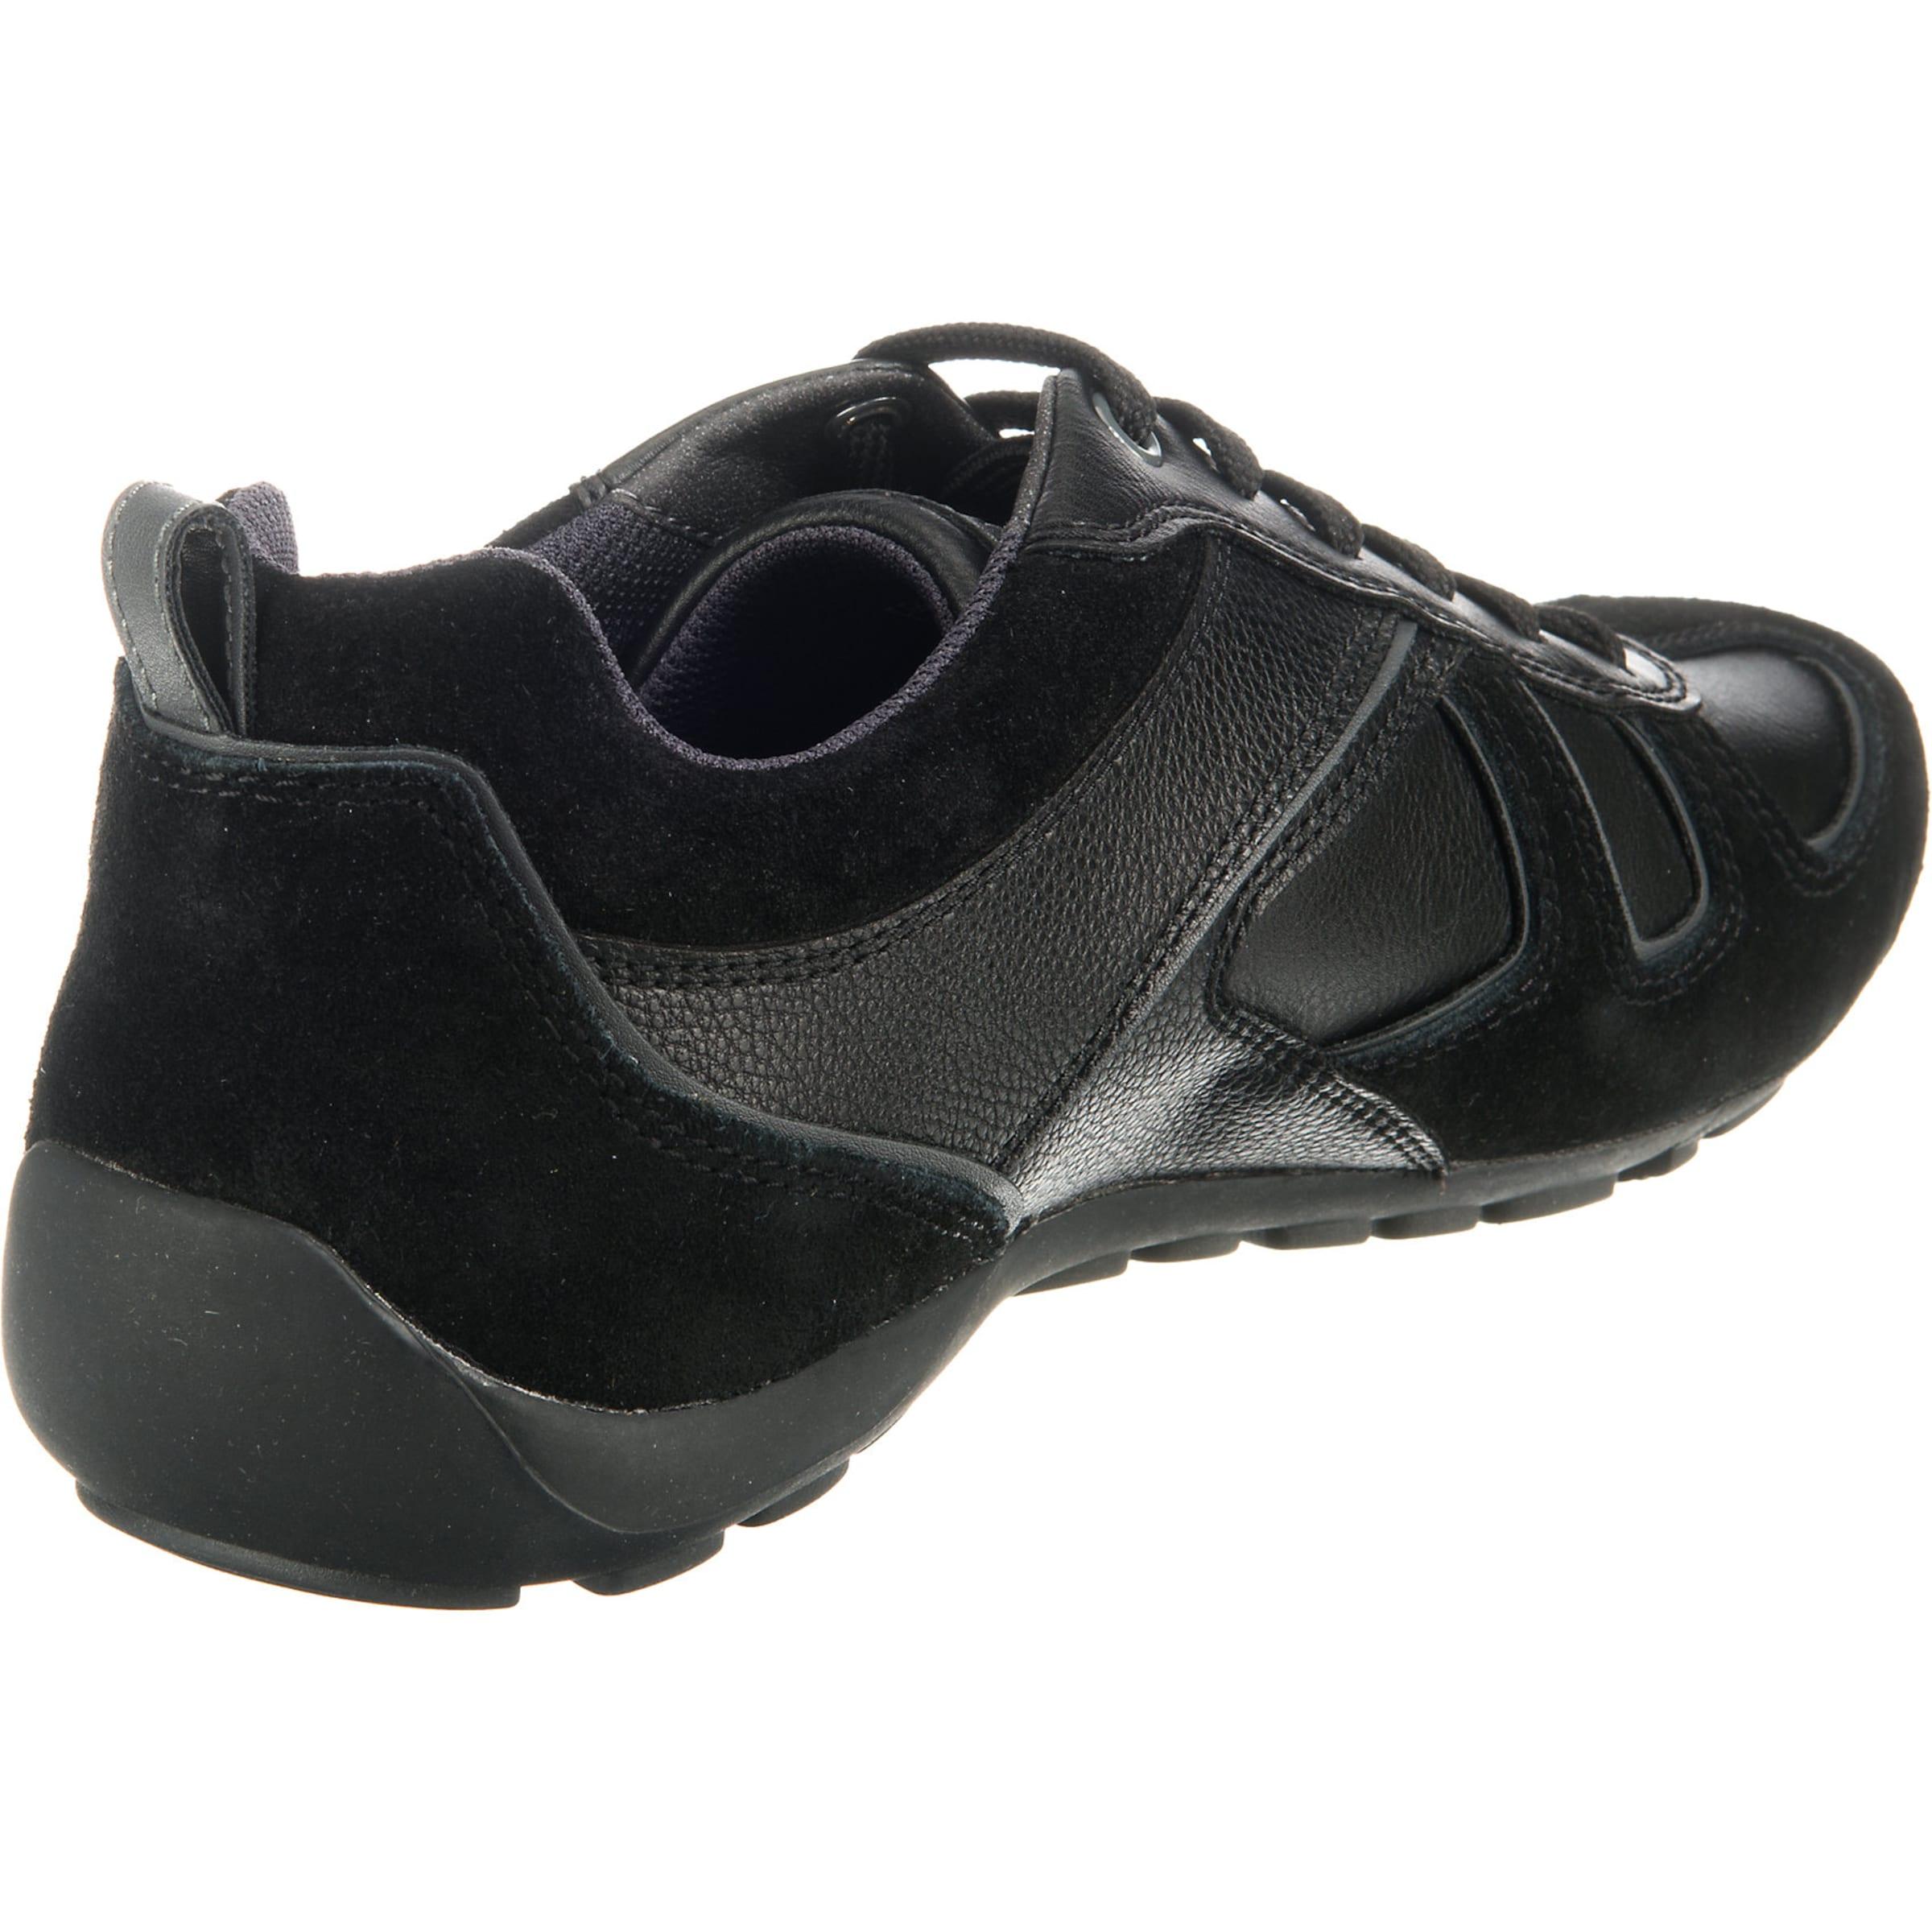 In Low 'u Ravex' Schwarz Geox Sneakers c3jSLqAR54